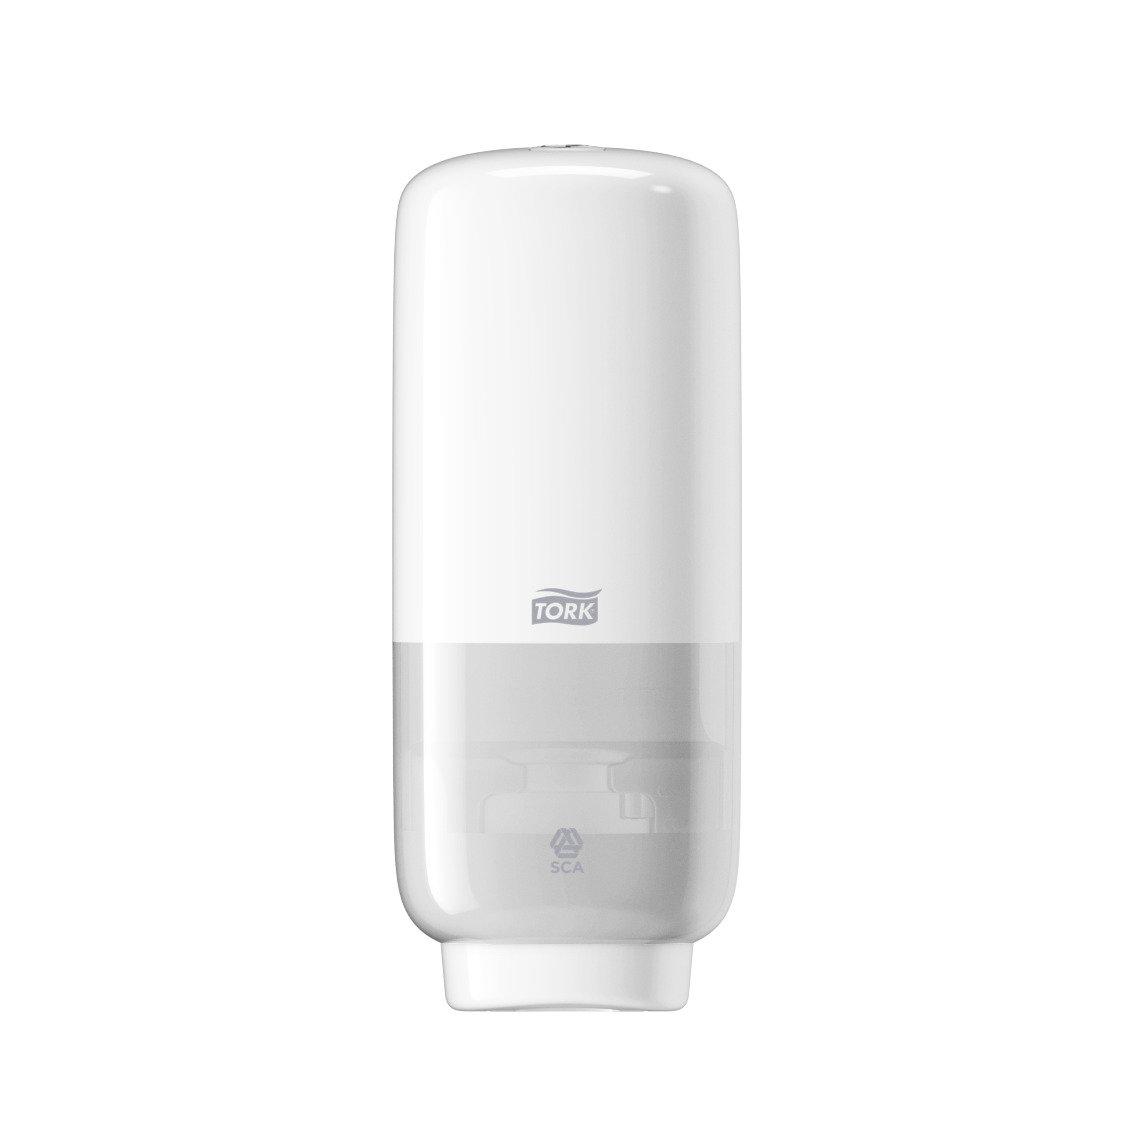 Tork 561608 Foam Soap Dispenser with Intuition Sensor S4 / Robust Wall Mounted Hand Wash Dispenser in Modern Elevation Design/Black SCA